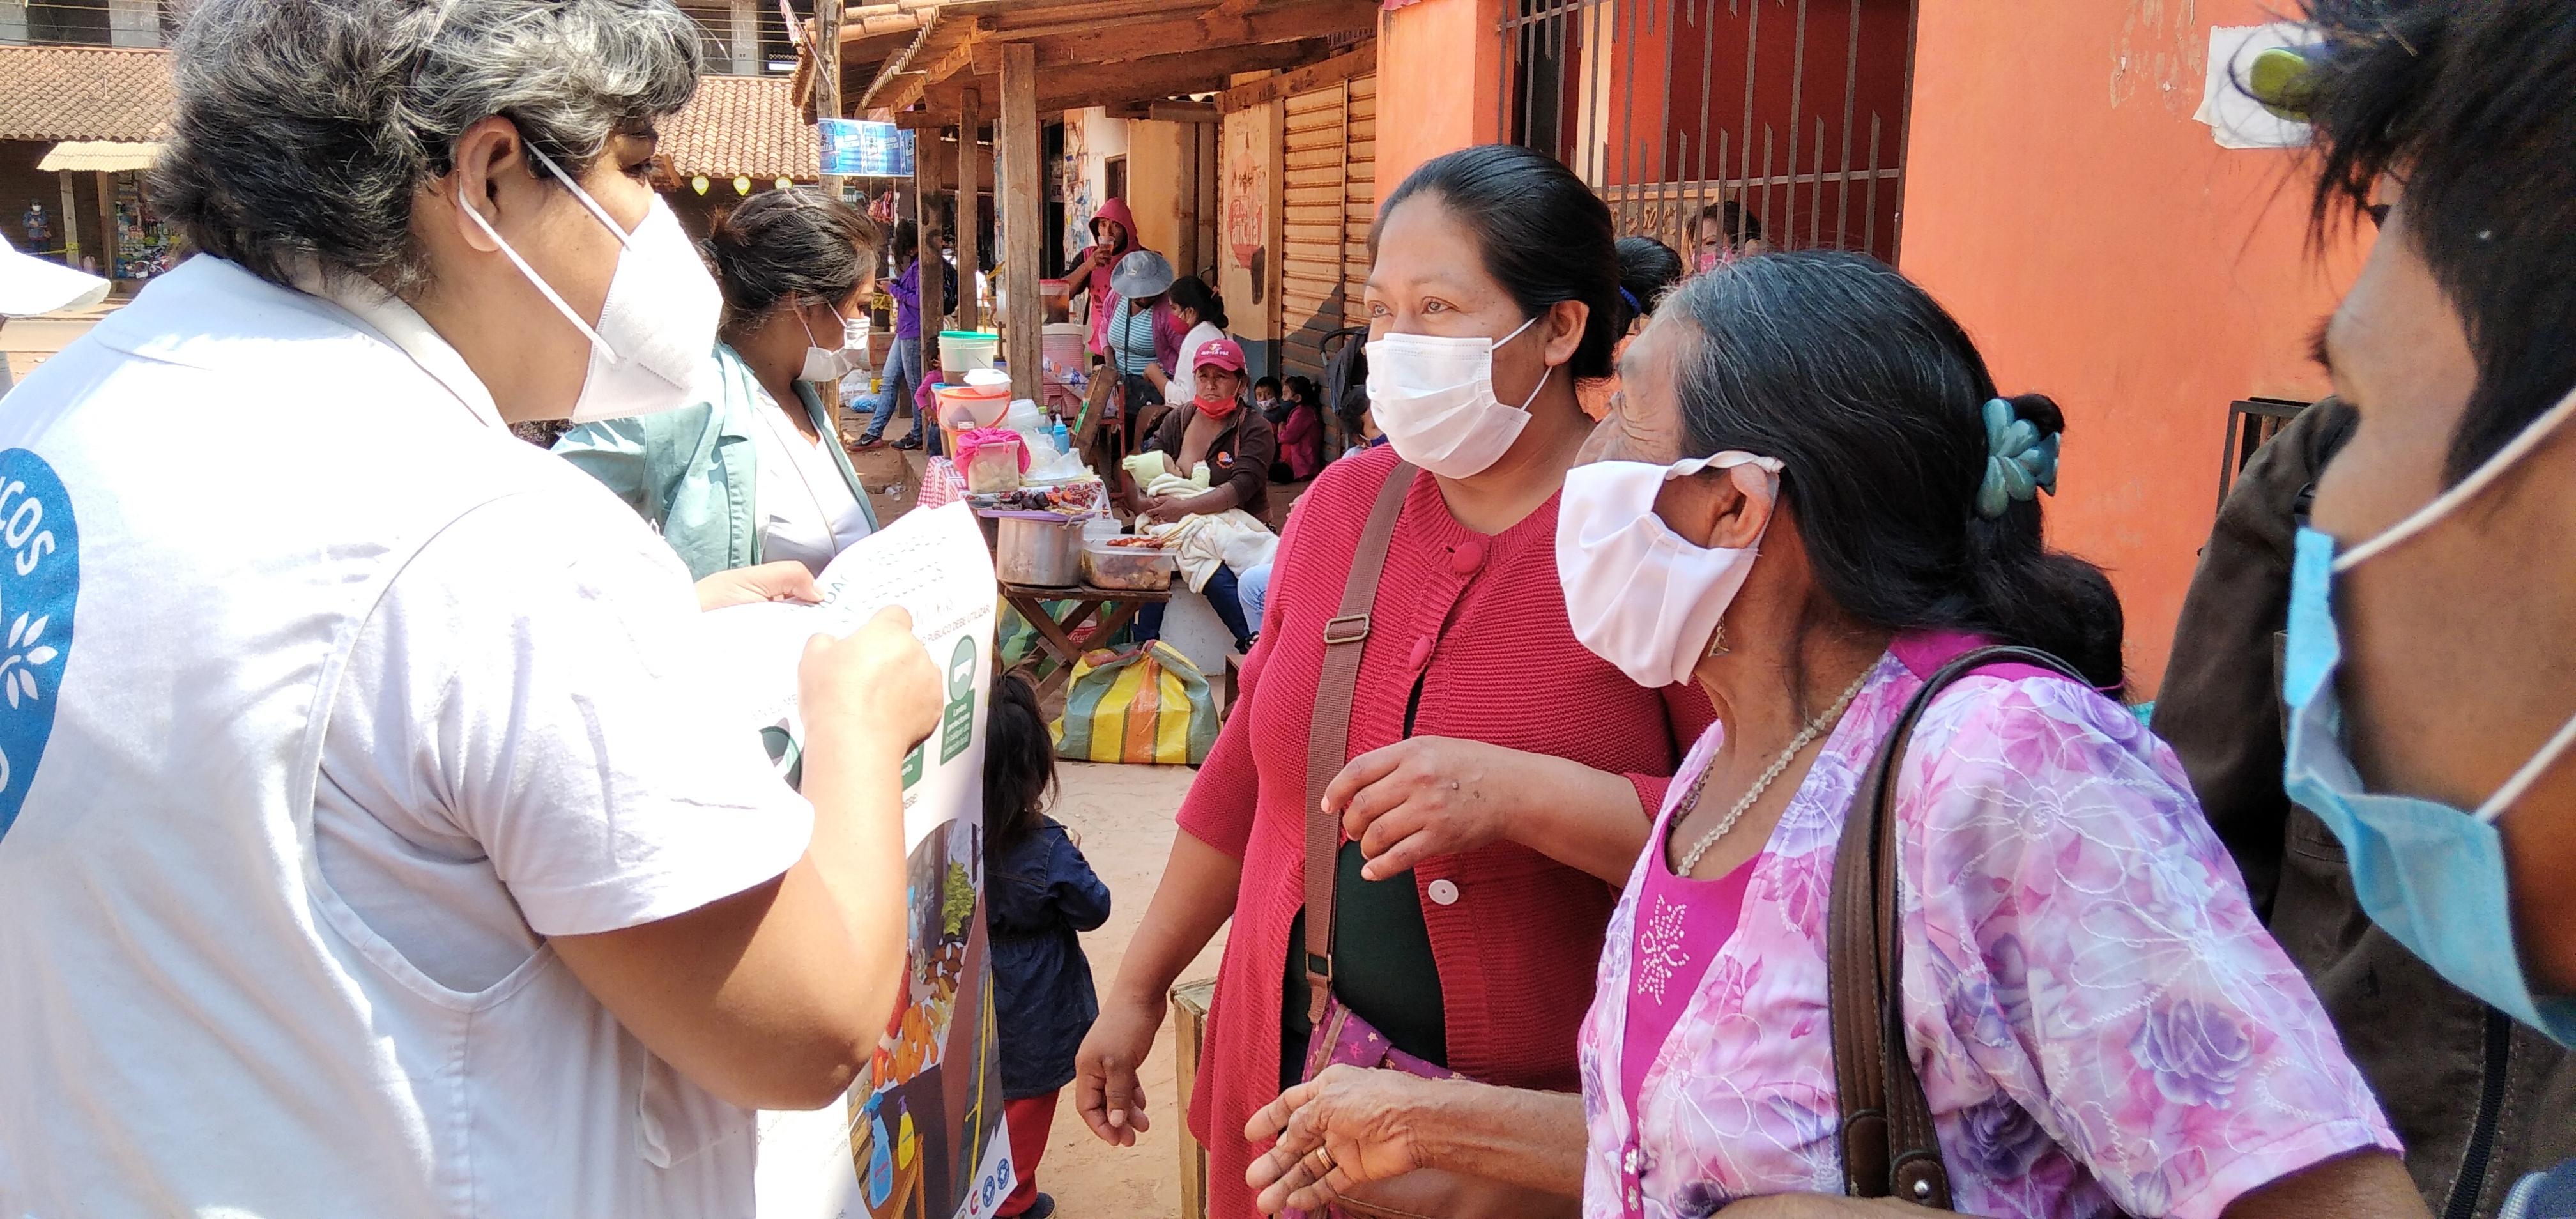 Informando sobre la pandemia en San Ignacio de Velasco. Santa Cruz